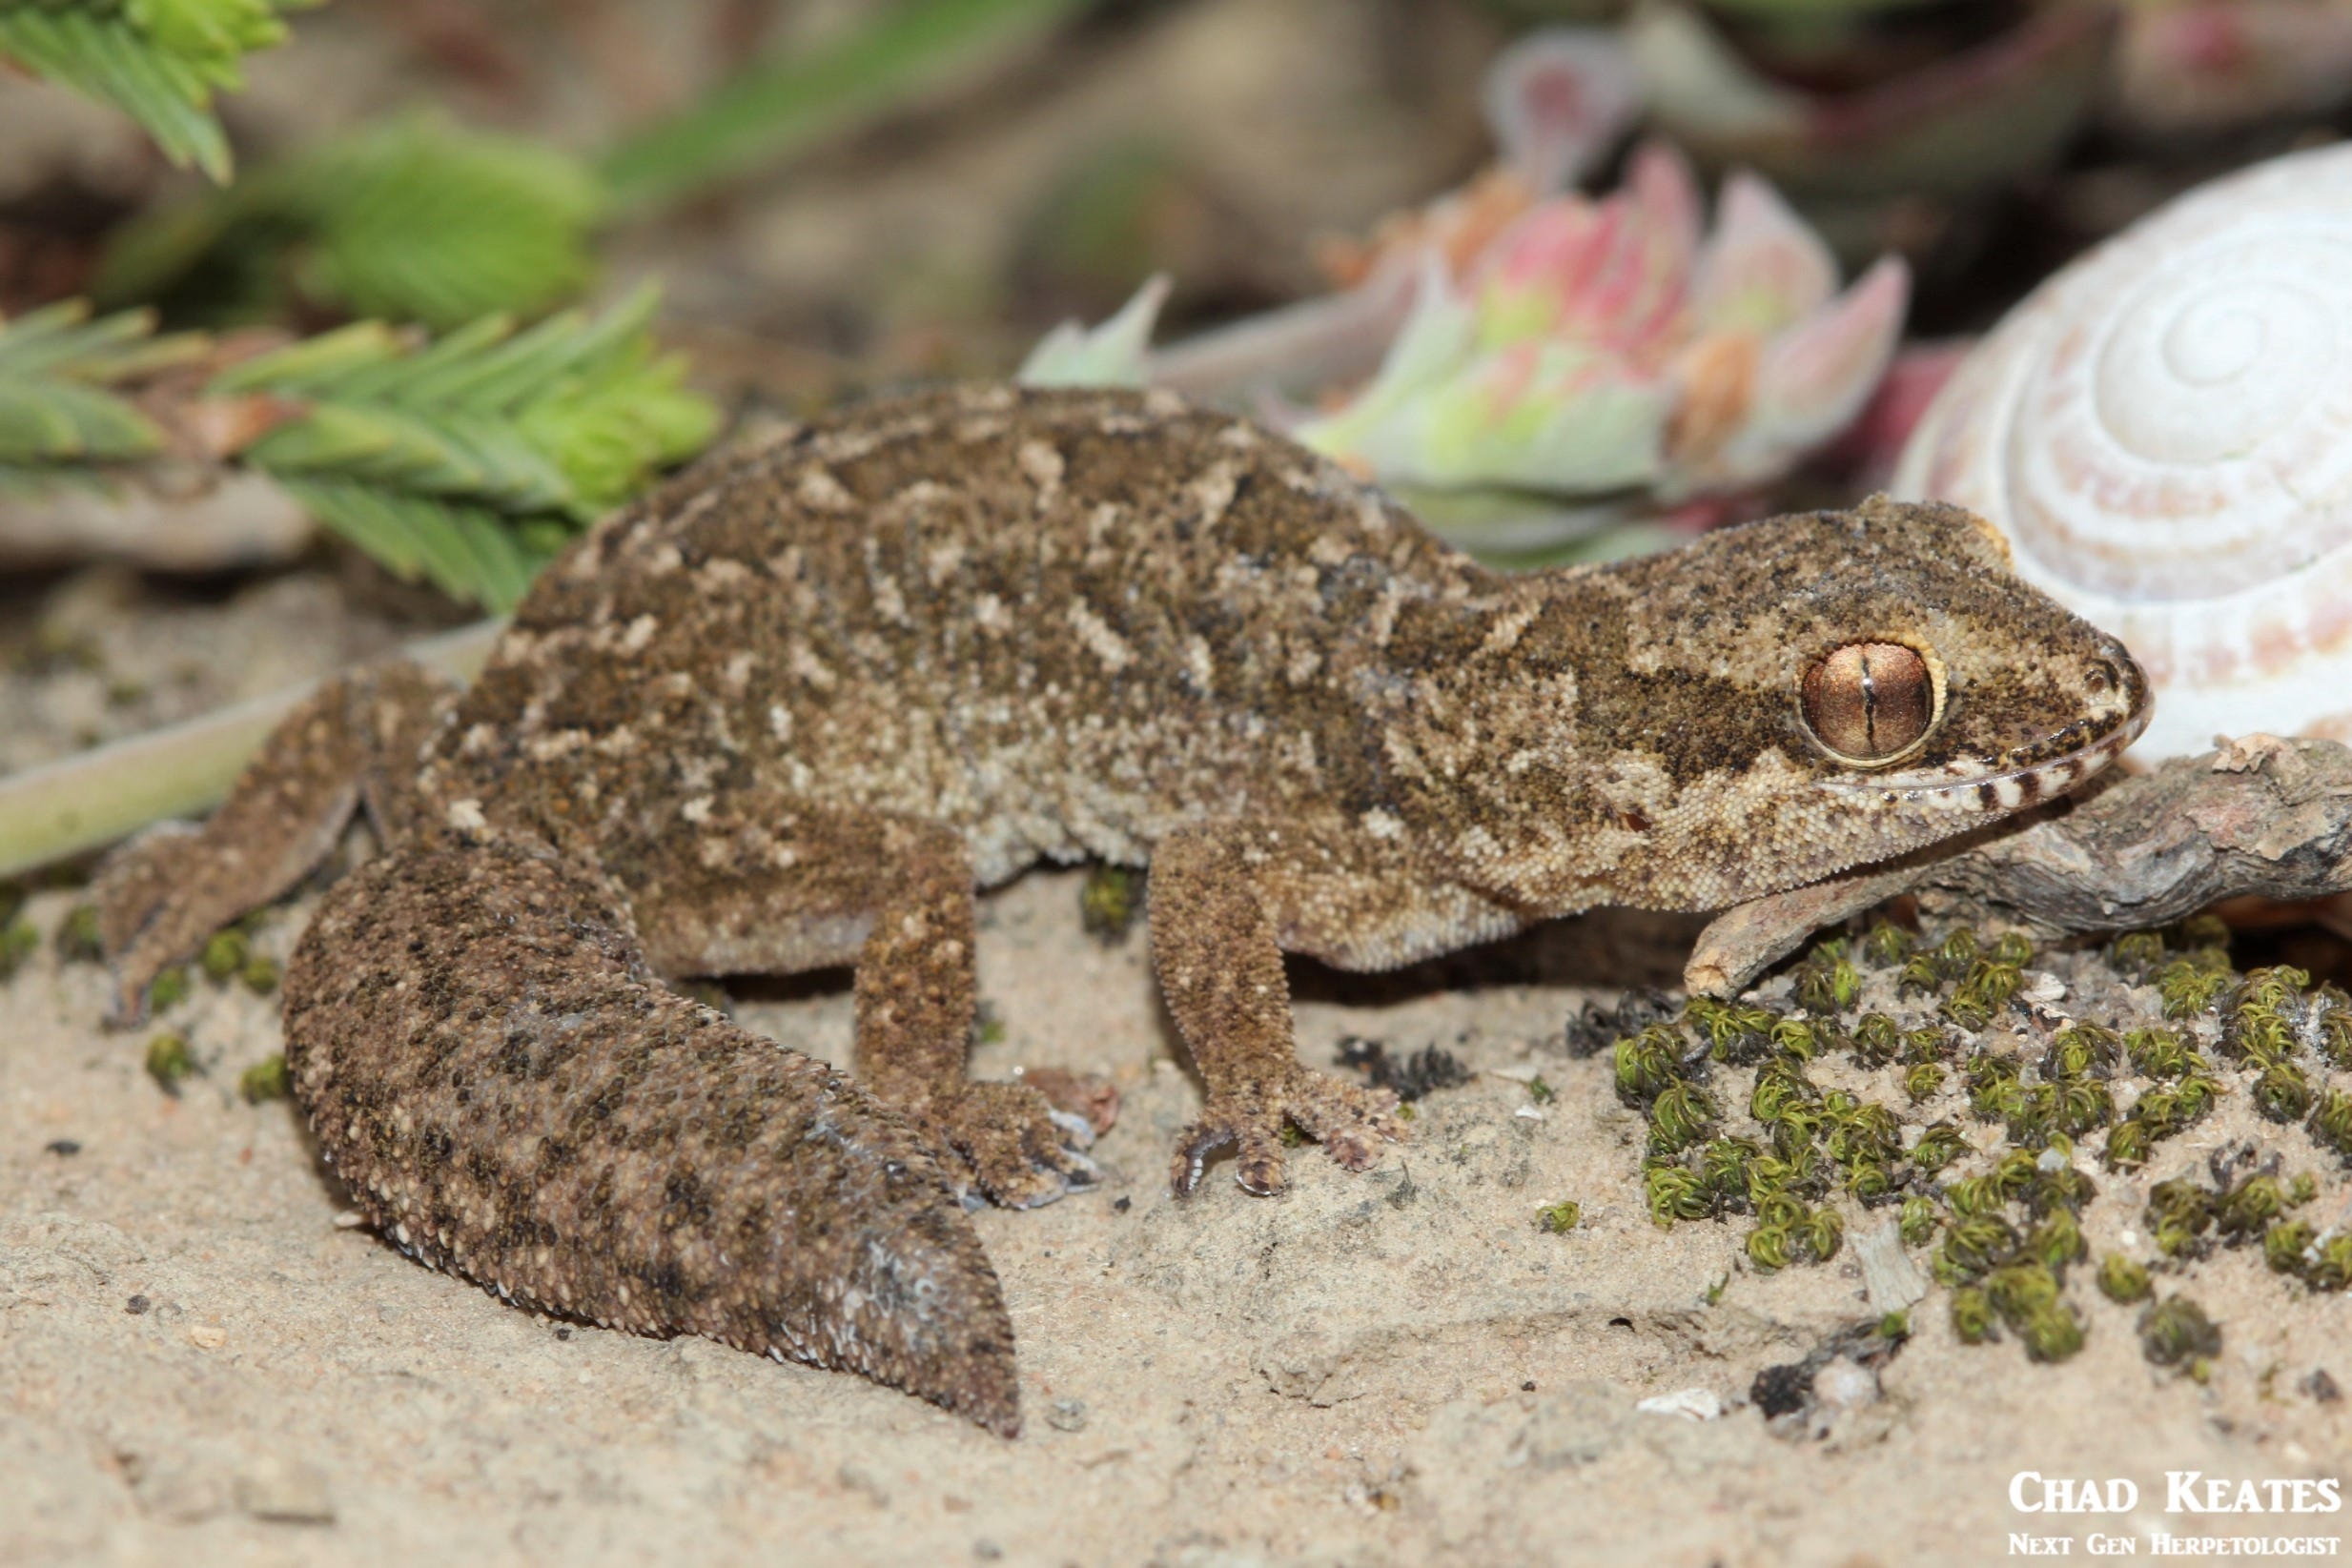 Pachydactylus_maculatus_Spotted_Gecko_Chad_Keates (5)